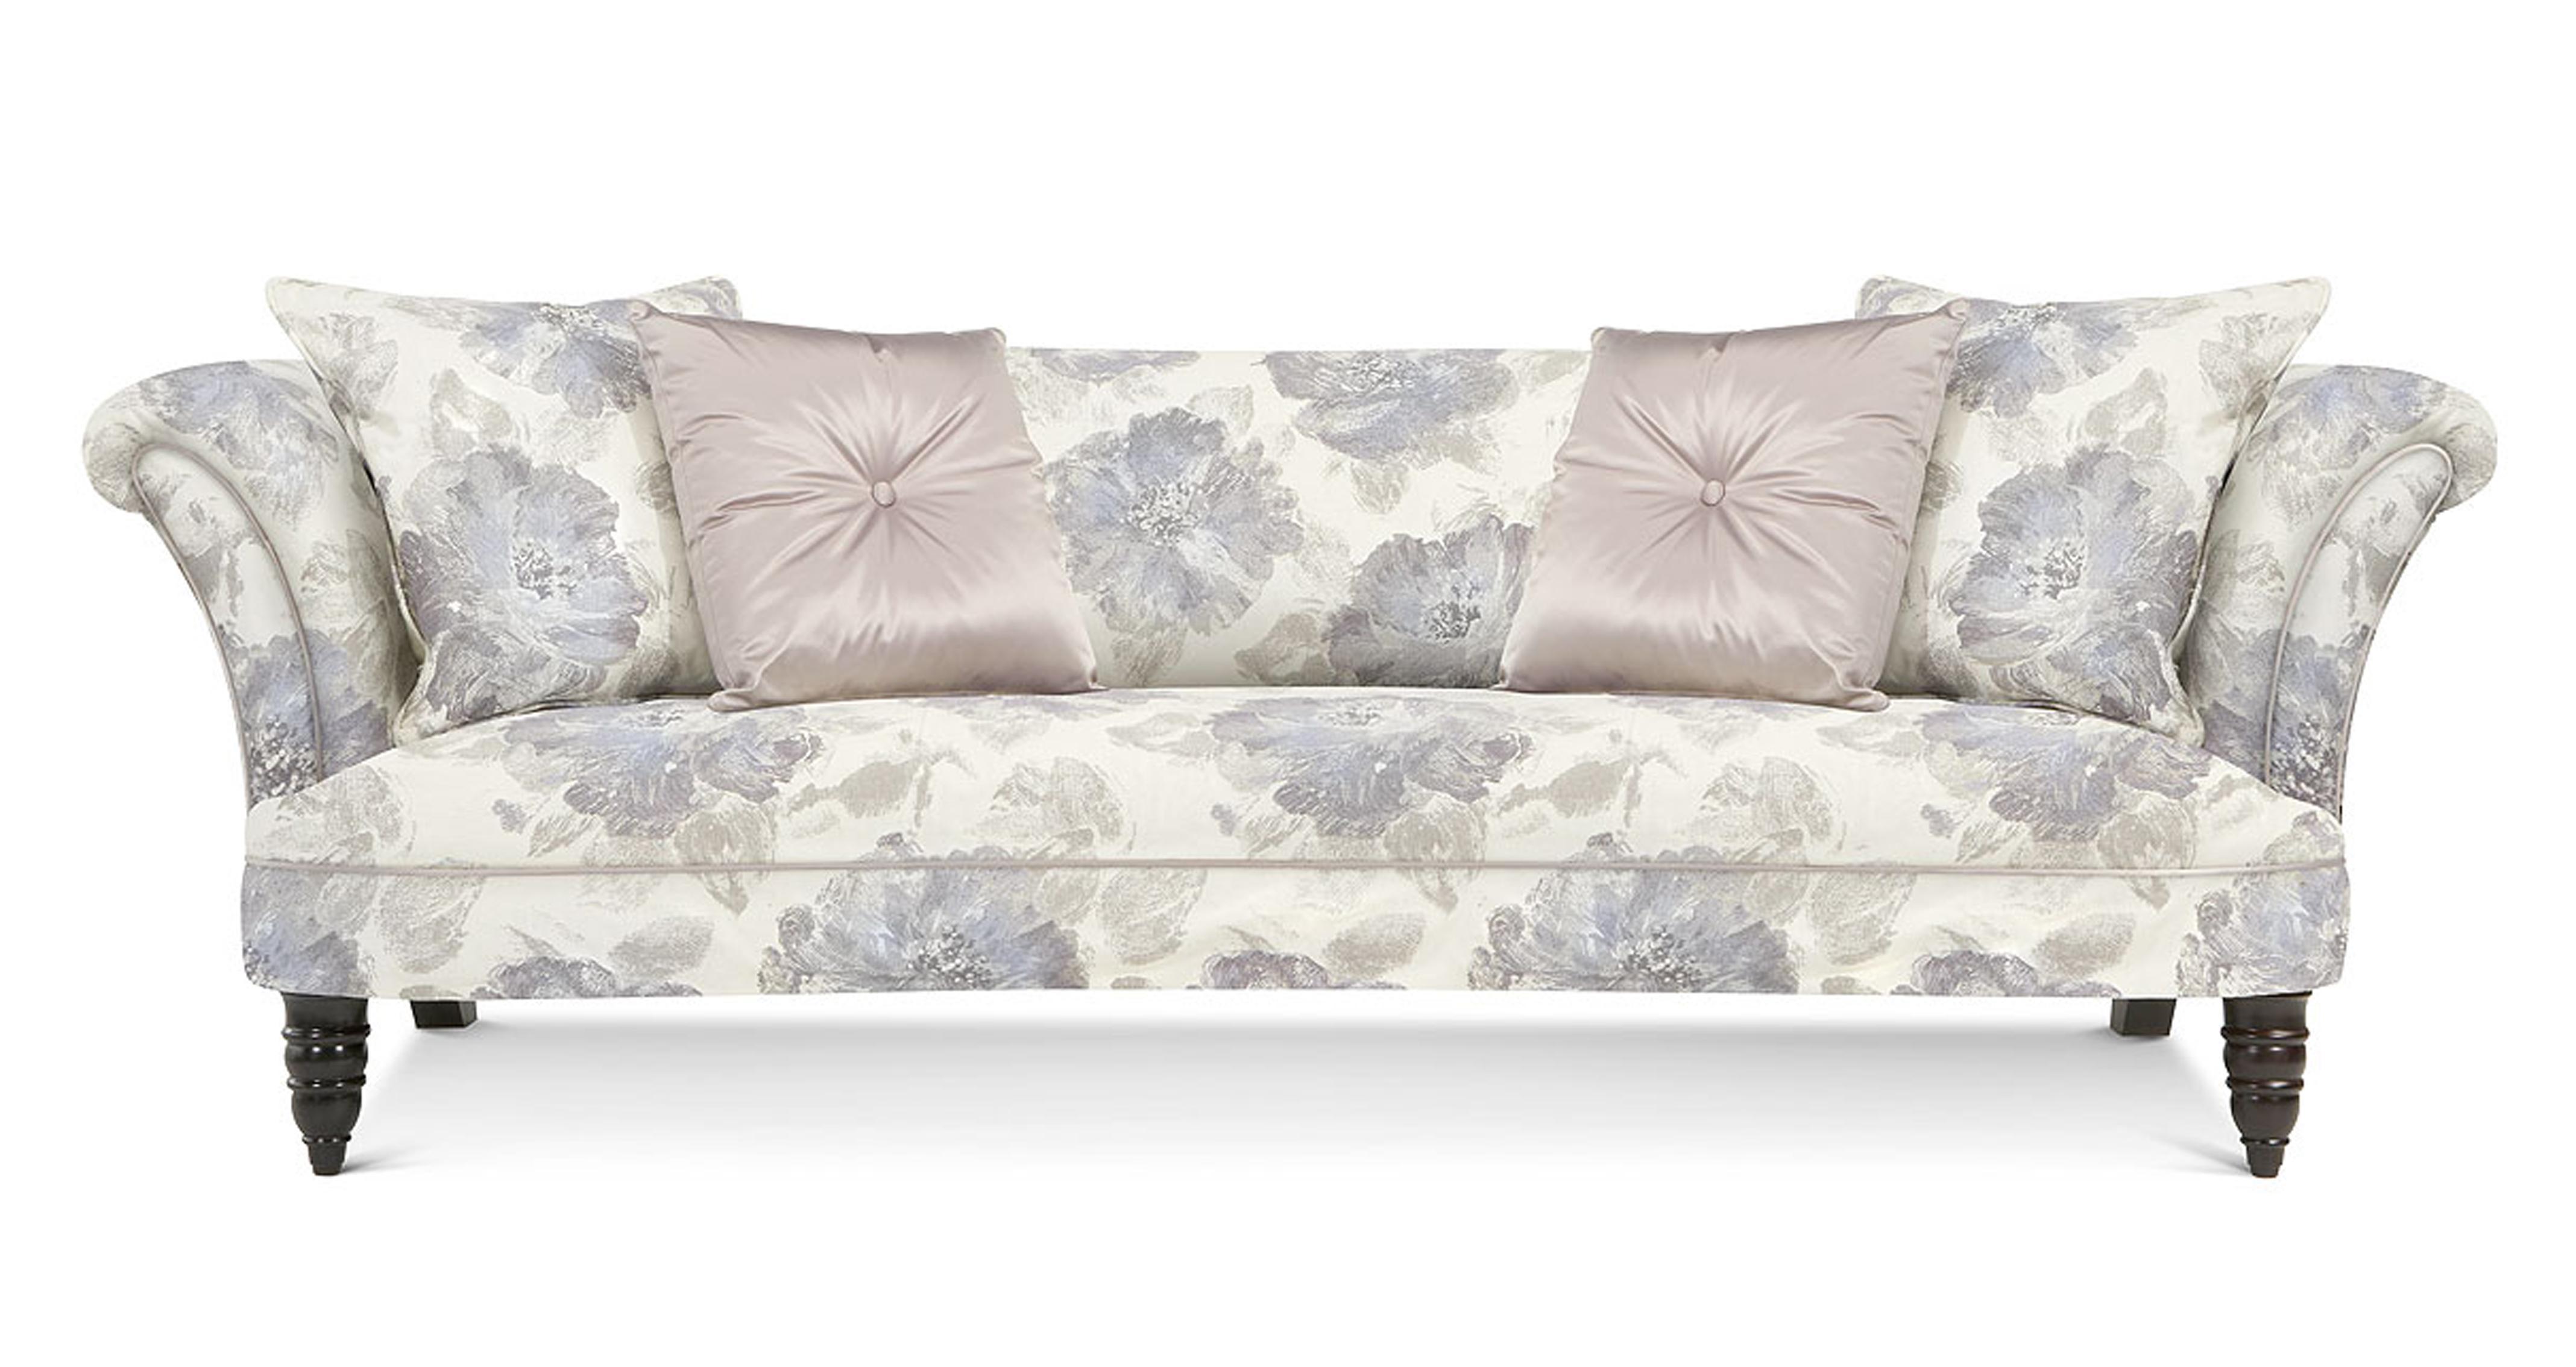 sofa 4 seater black faux leather futon concerto pattern dfs ireland